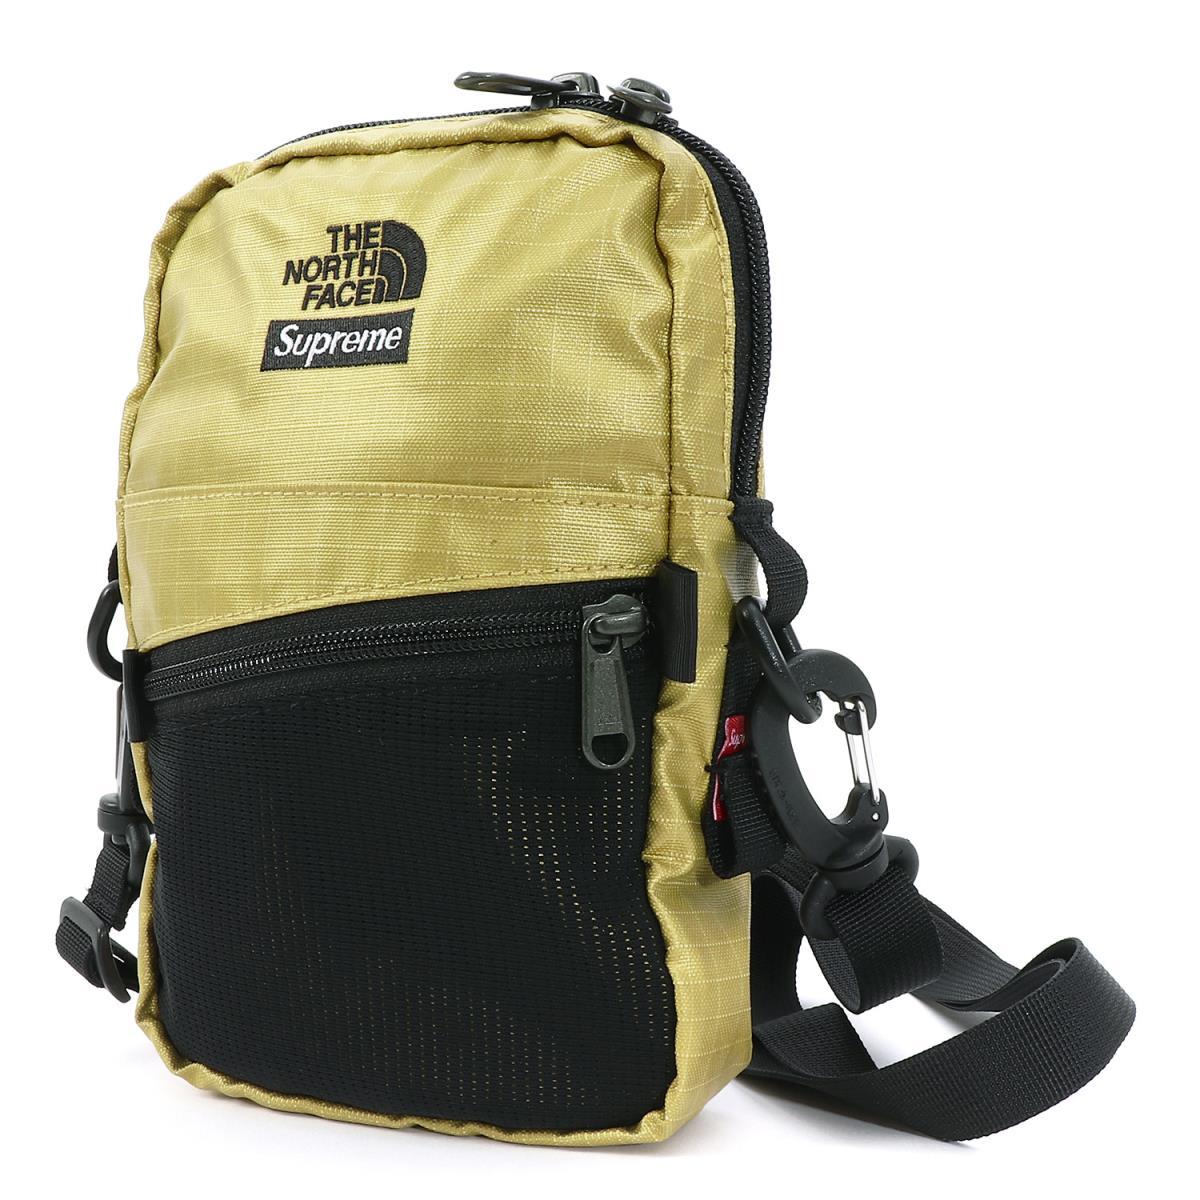 Supreme (シュプリーム) 18S/S ×THE NORTH FACE メタリックショルダーバッグ(Metallic Shoulder Bag) ゴールド 【メンズ】【美品】【K2058】【中古】【あす楽☆対応可】